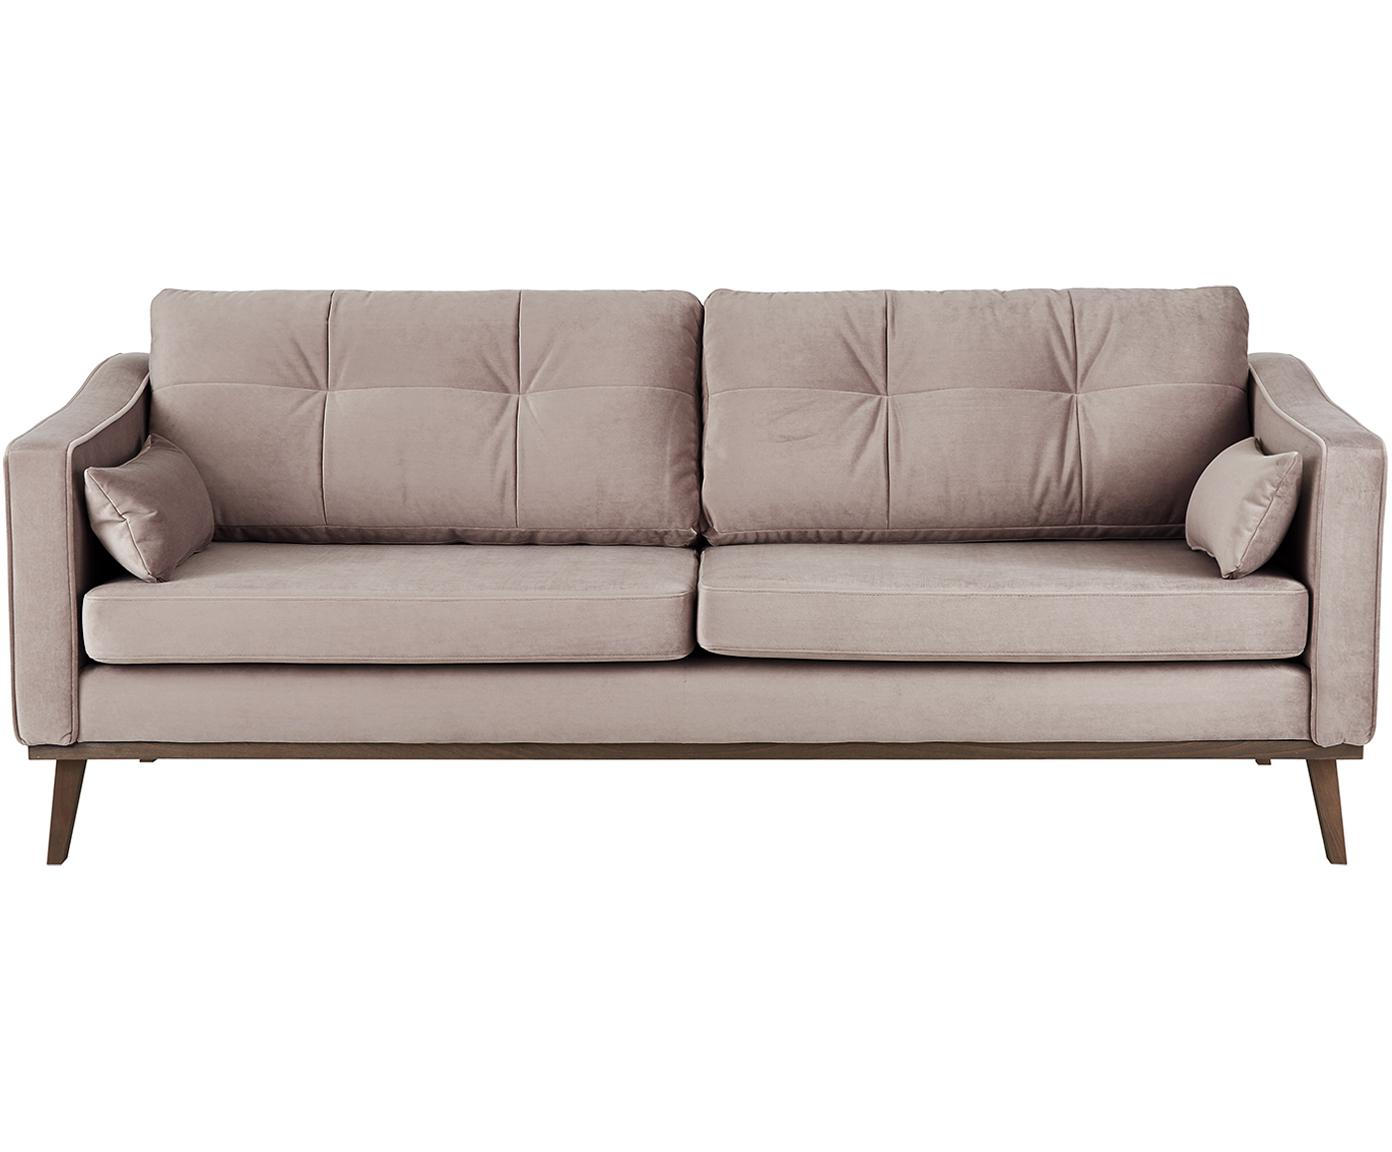 Samt-Sofa Alva (3-Sitzer), Bezug: Samt (Hochwertiger Polyes, Gestell: Massives Kiefernholz, Samt Taupe, B 215 x T 92 cm